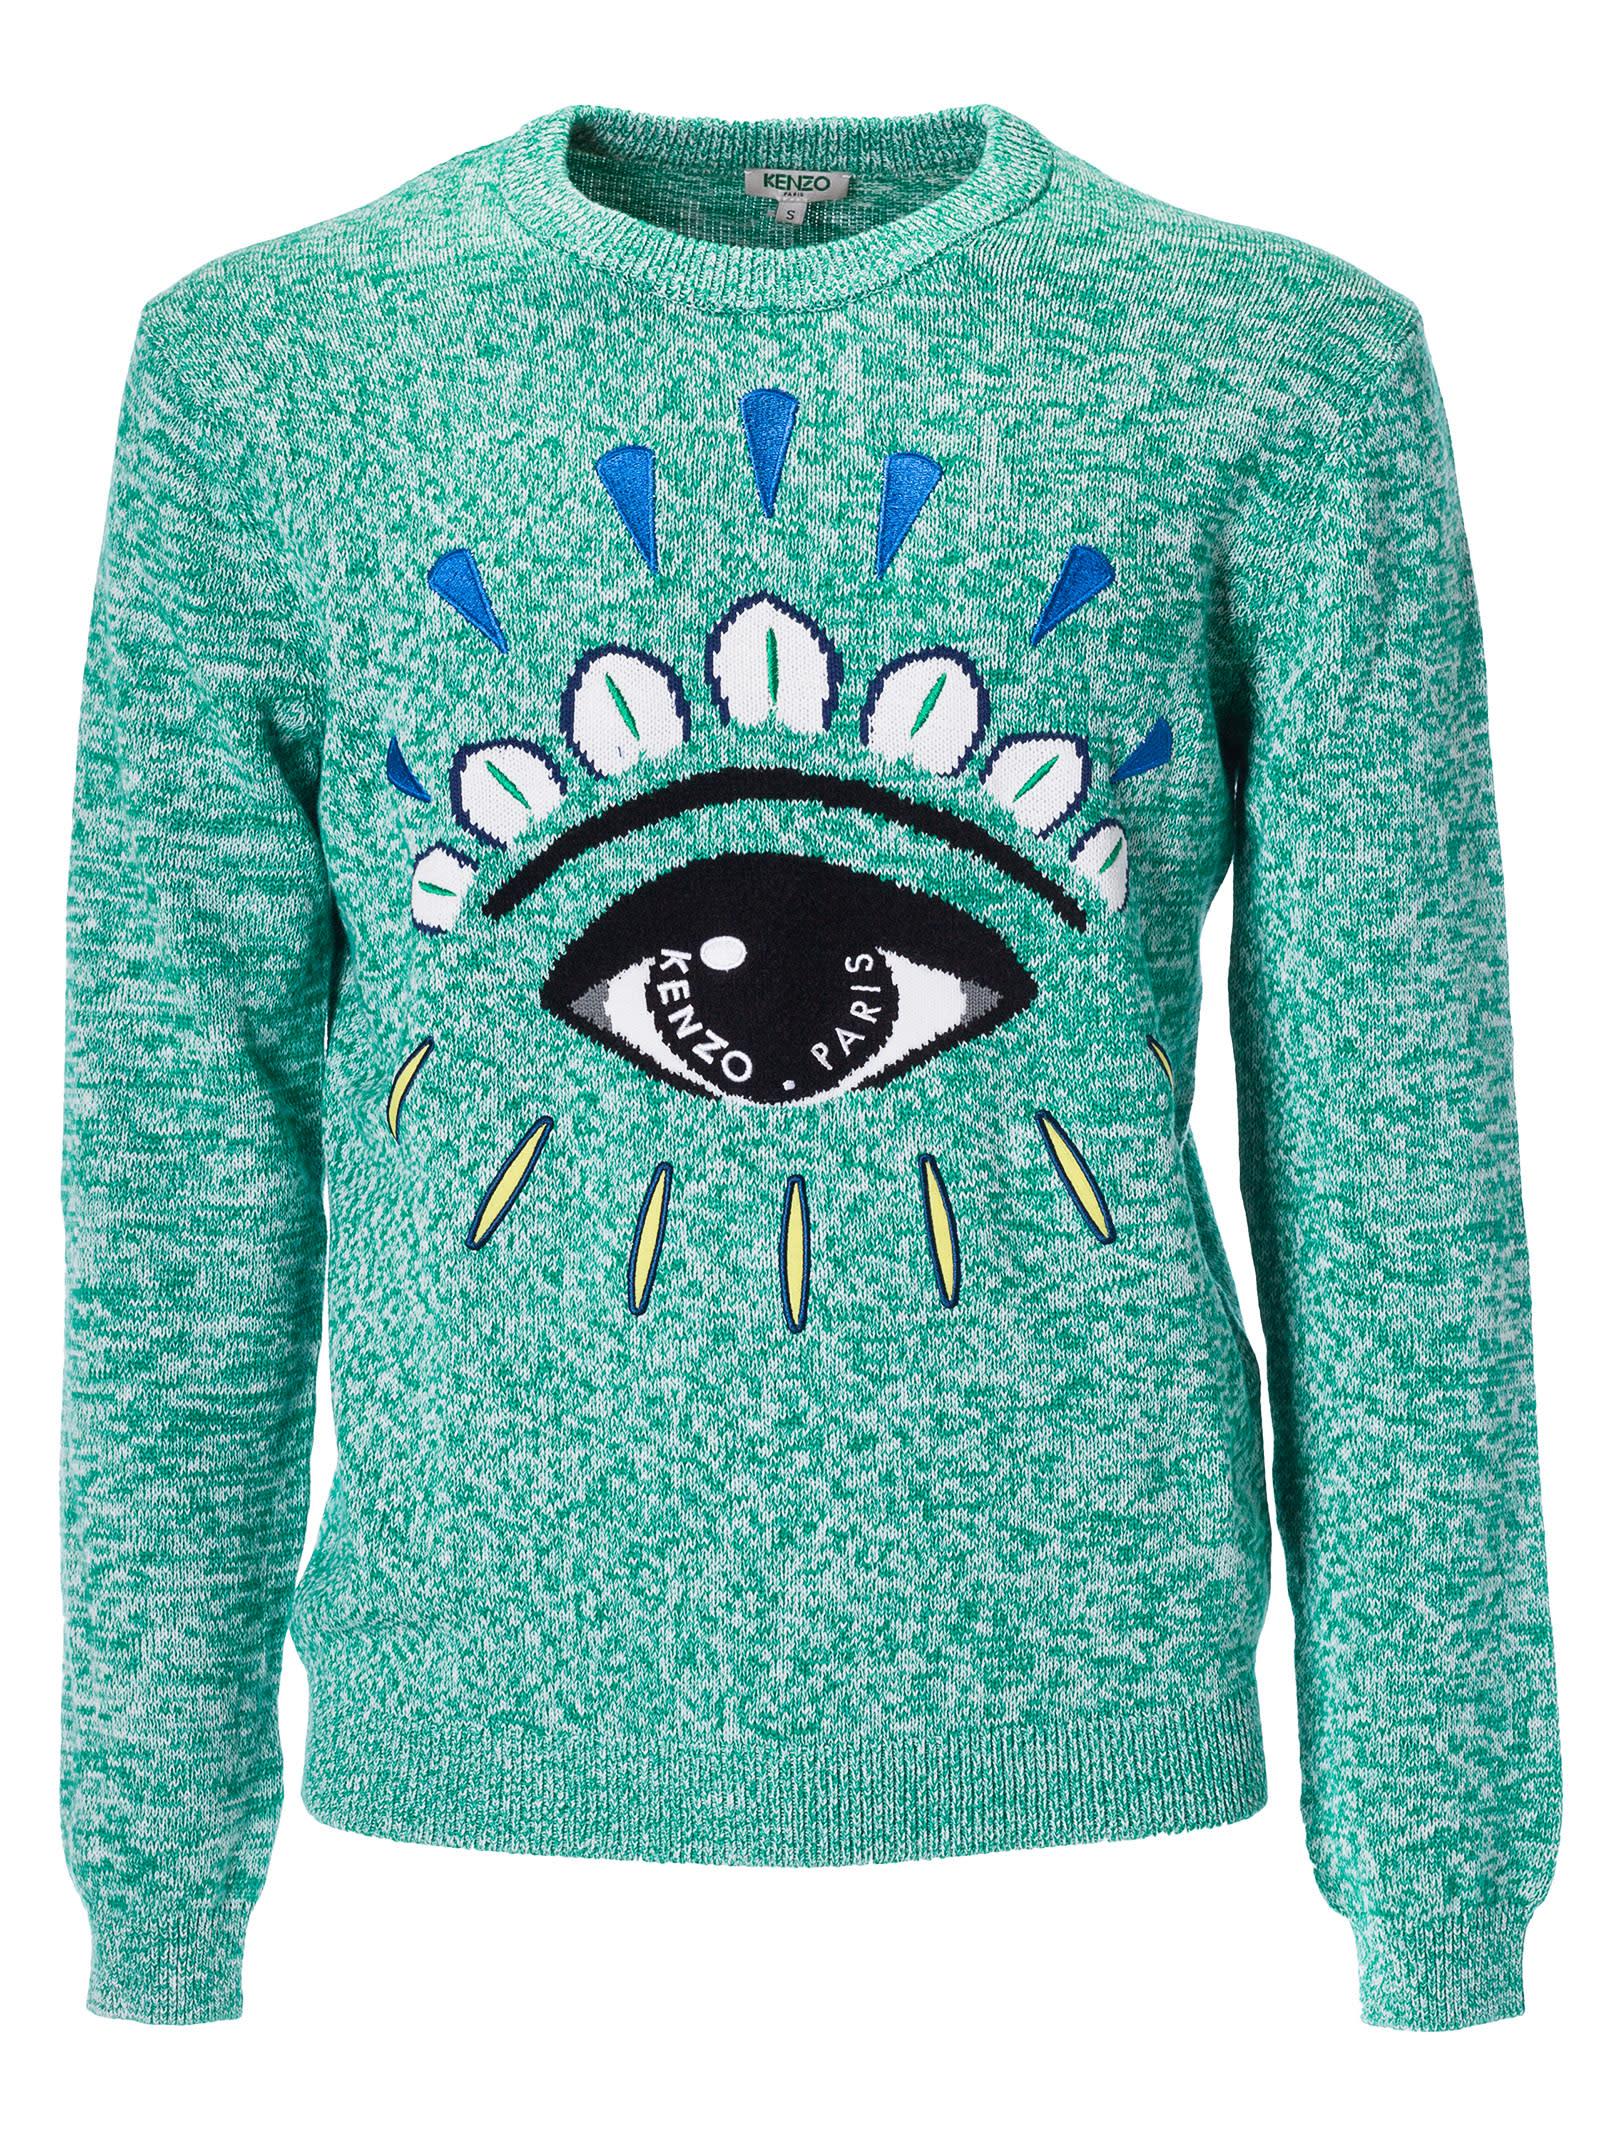 4b3418ddc9 Kenzo Eye Sweatshirt